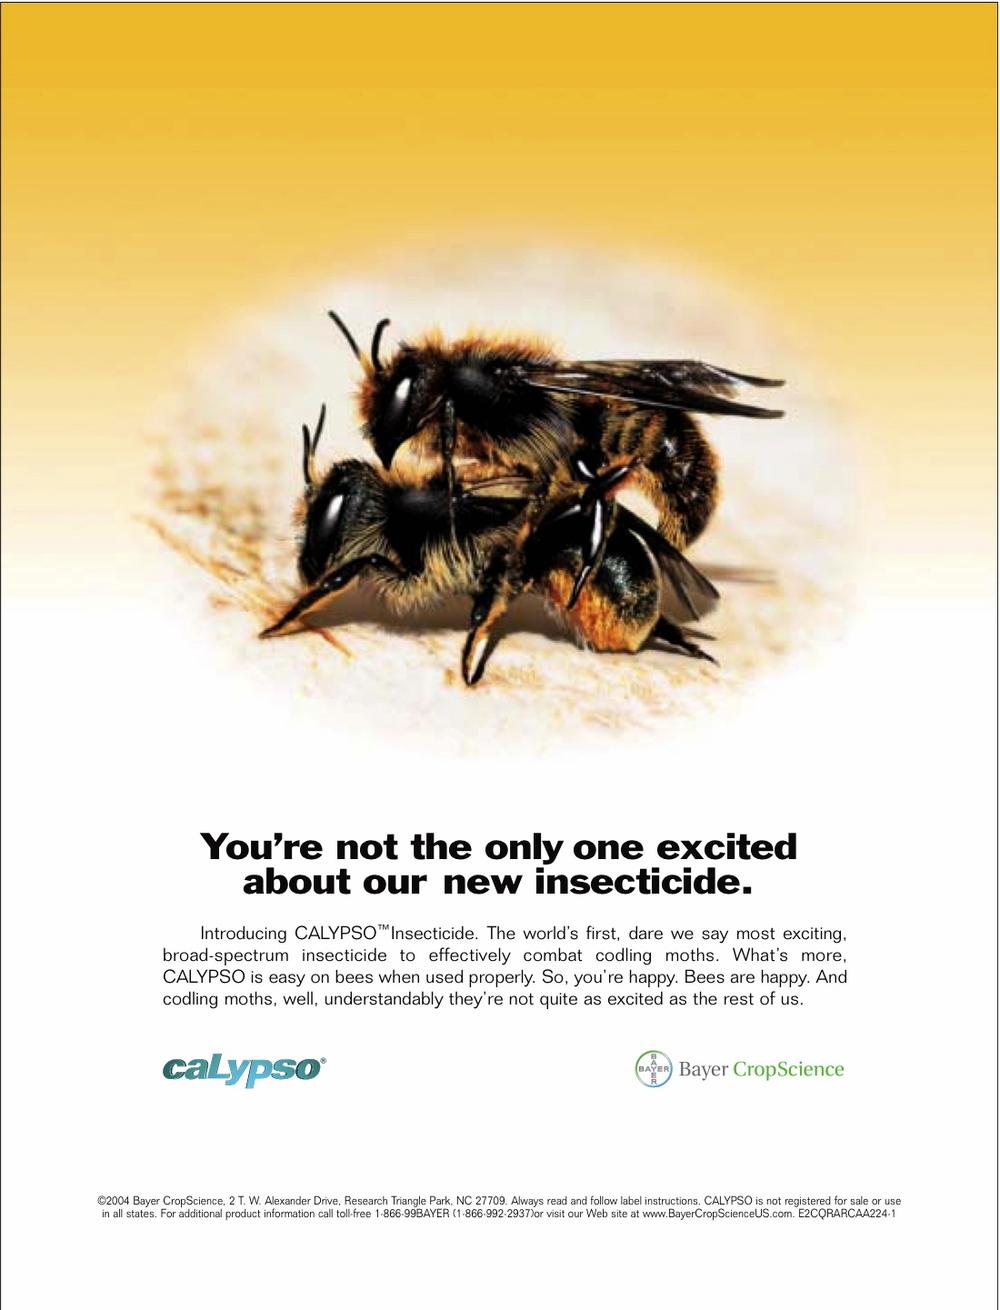 2004 Calypso Codling Moth Ad.jpg